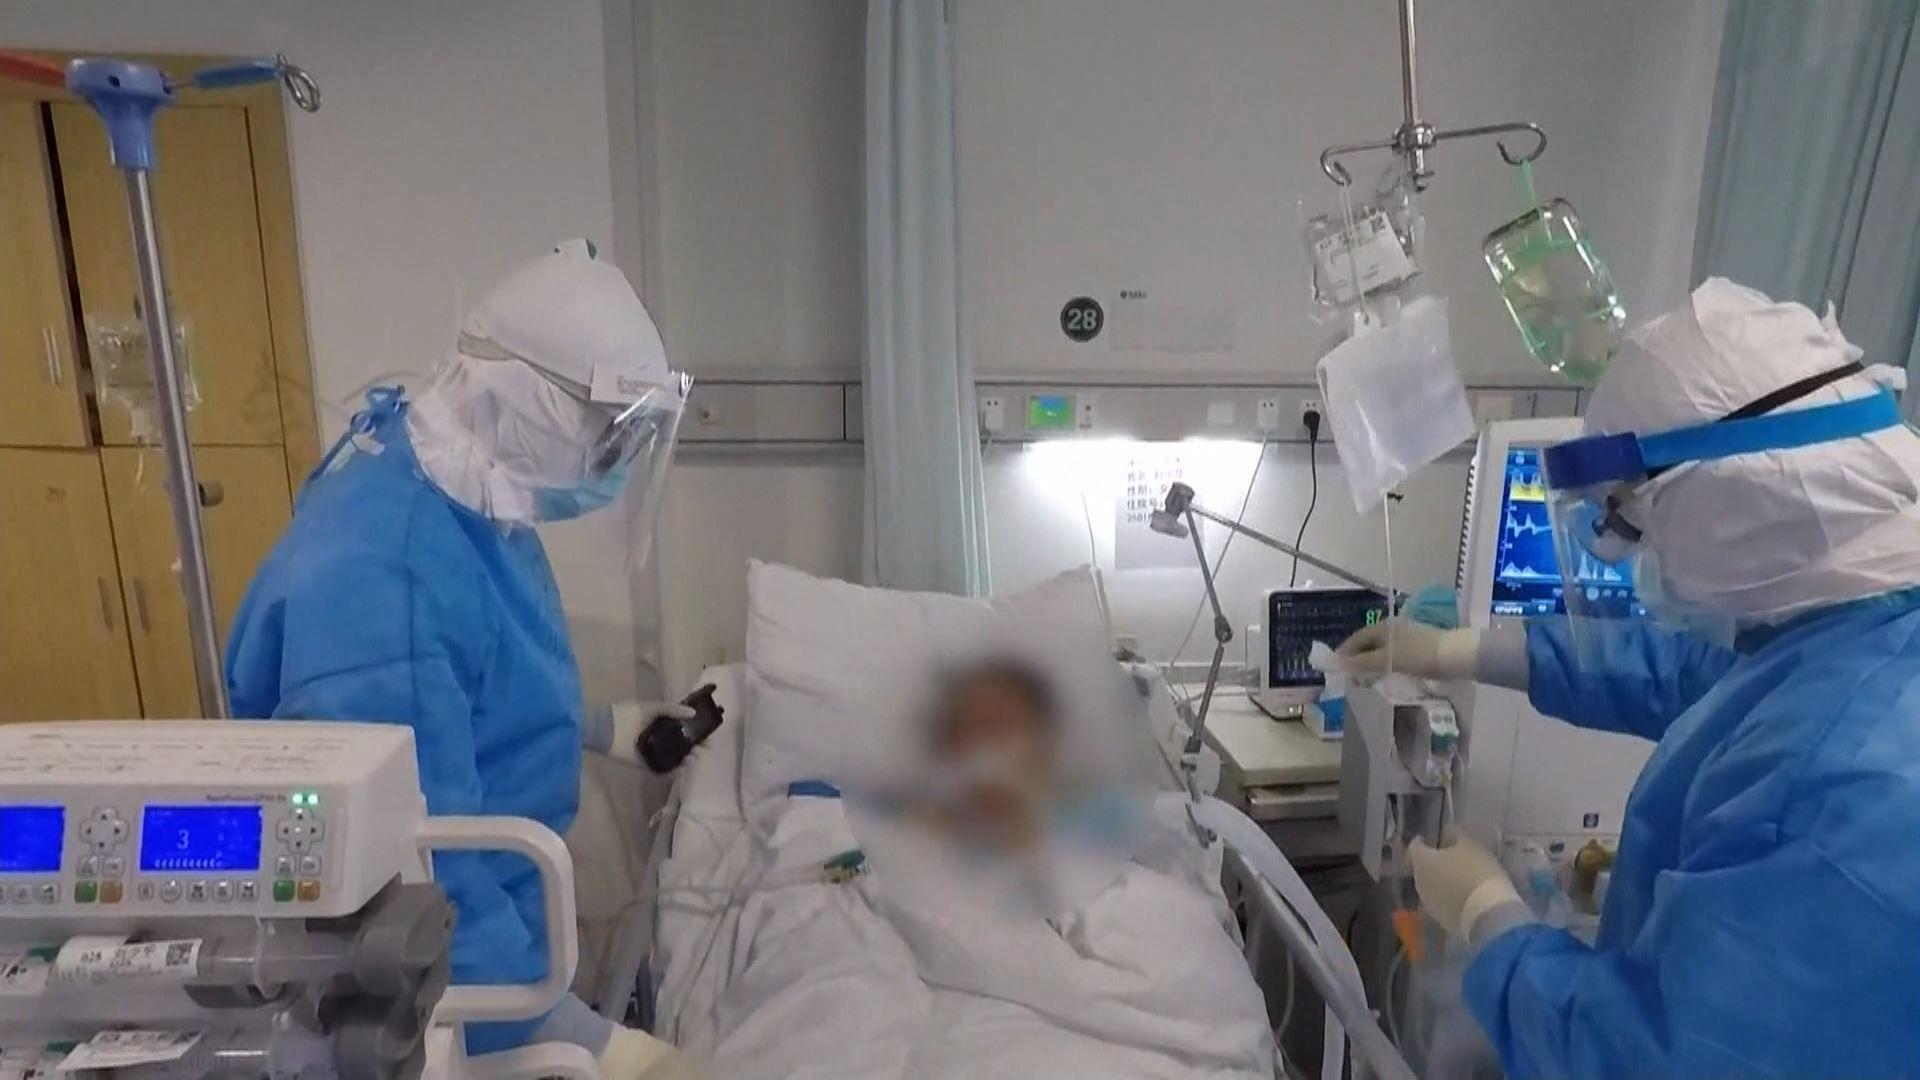 TLAXCALA REPORTA SU PRIMERA MUERTE POR COVID-19